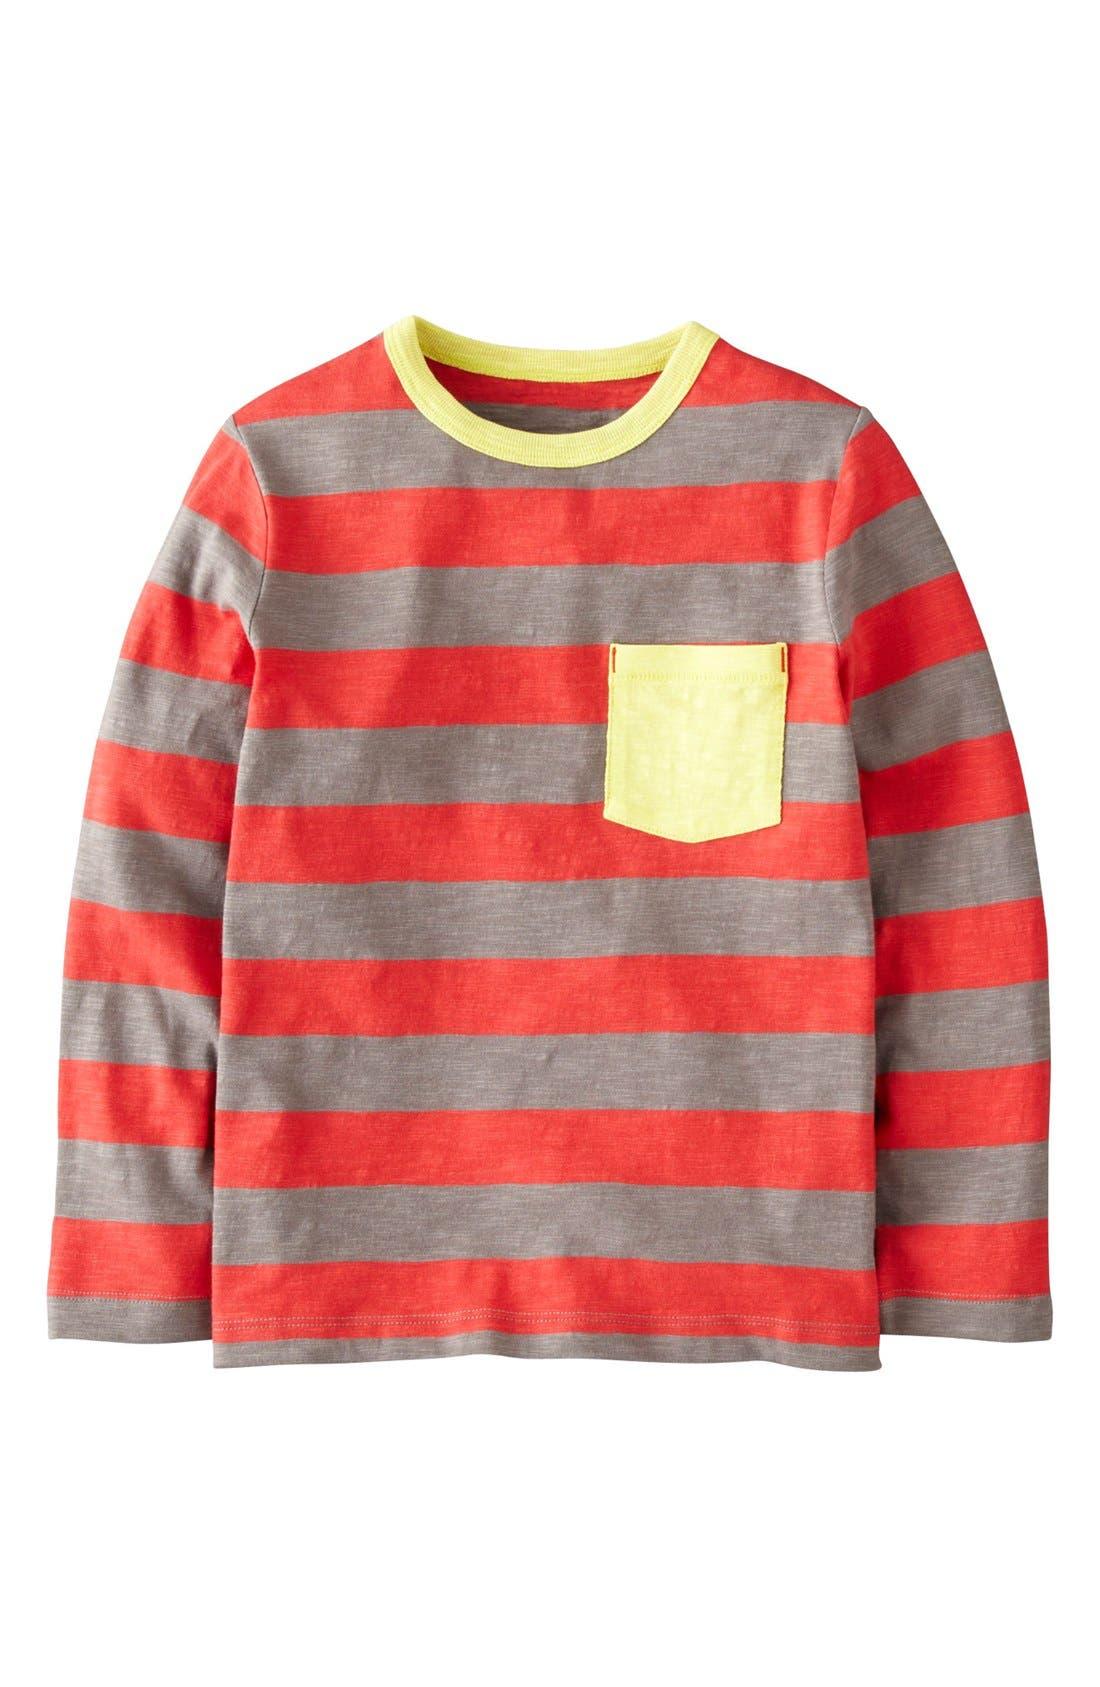 Main Image - Mini Boden Color Pop T-Shirt (Toddler Boys, Little Boys & Big Boys)